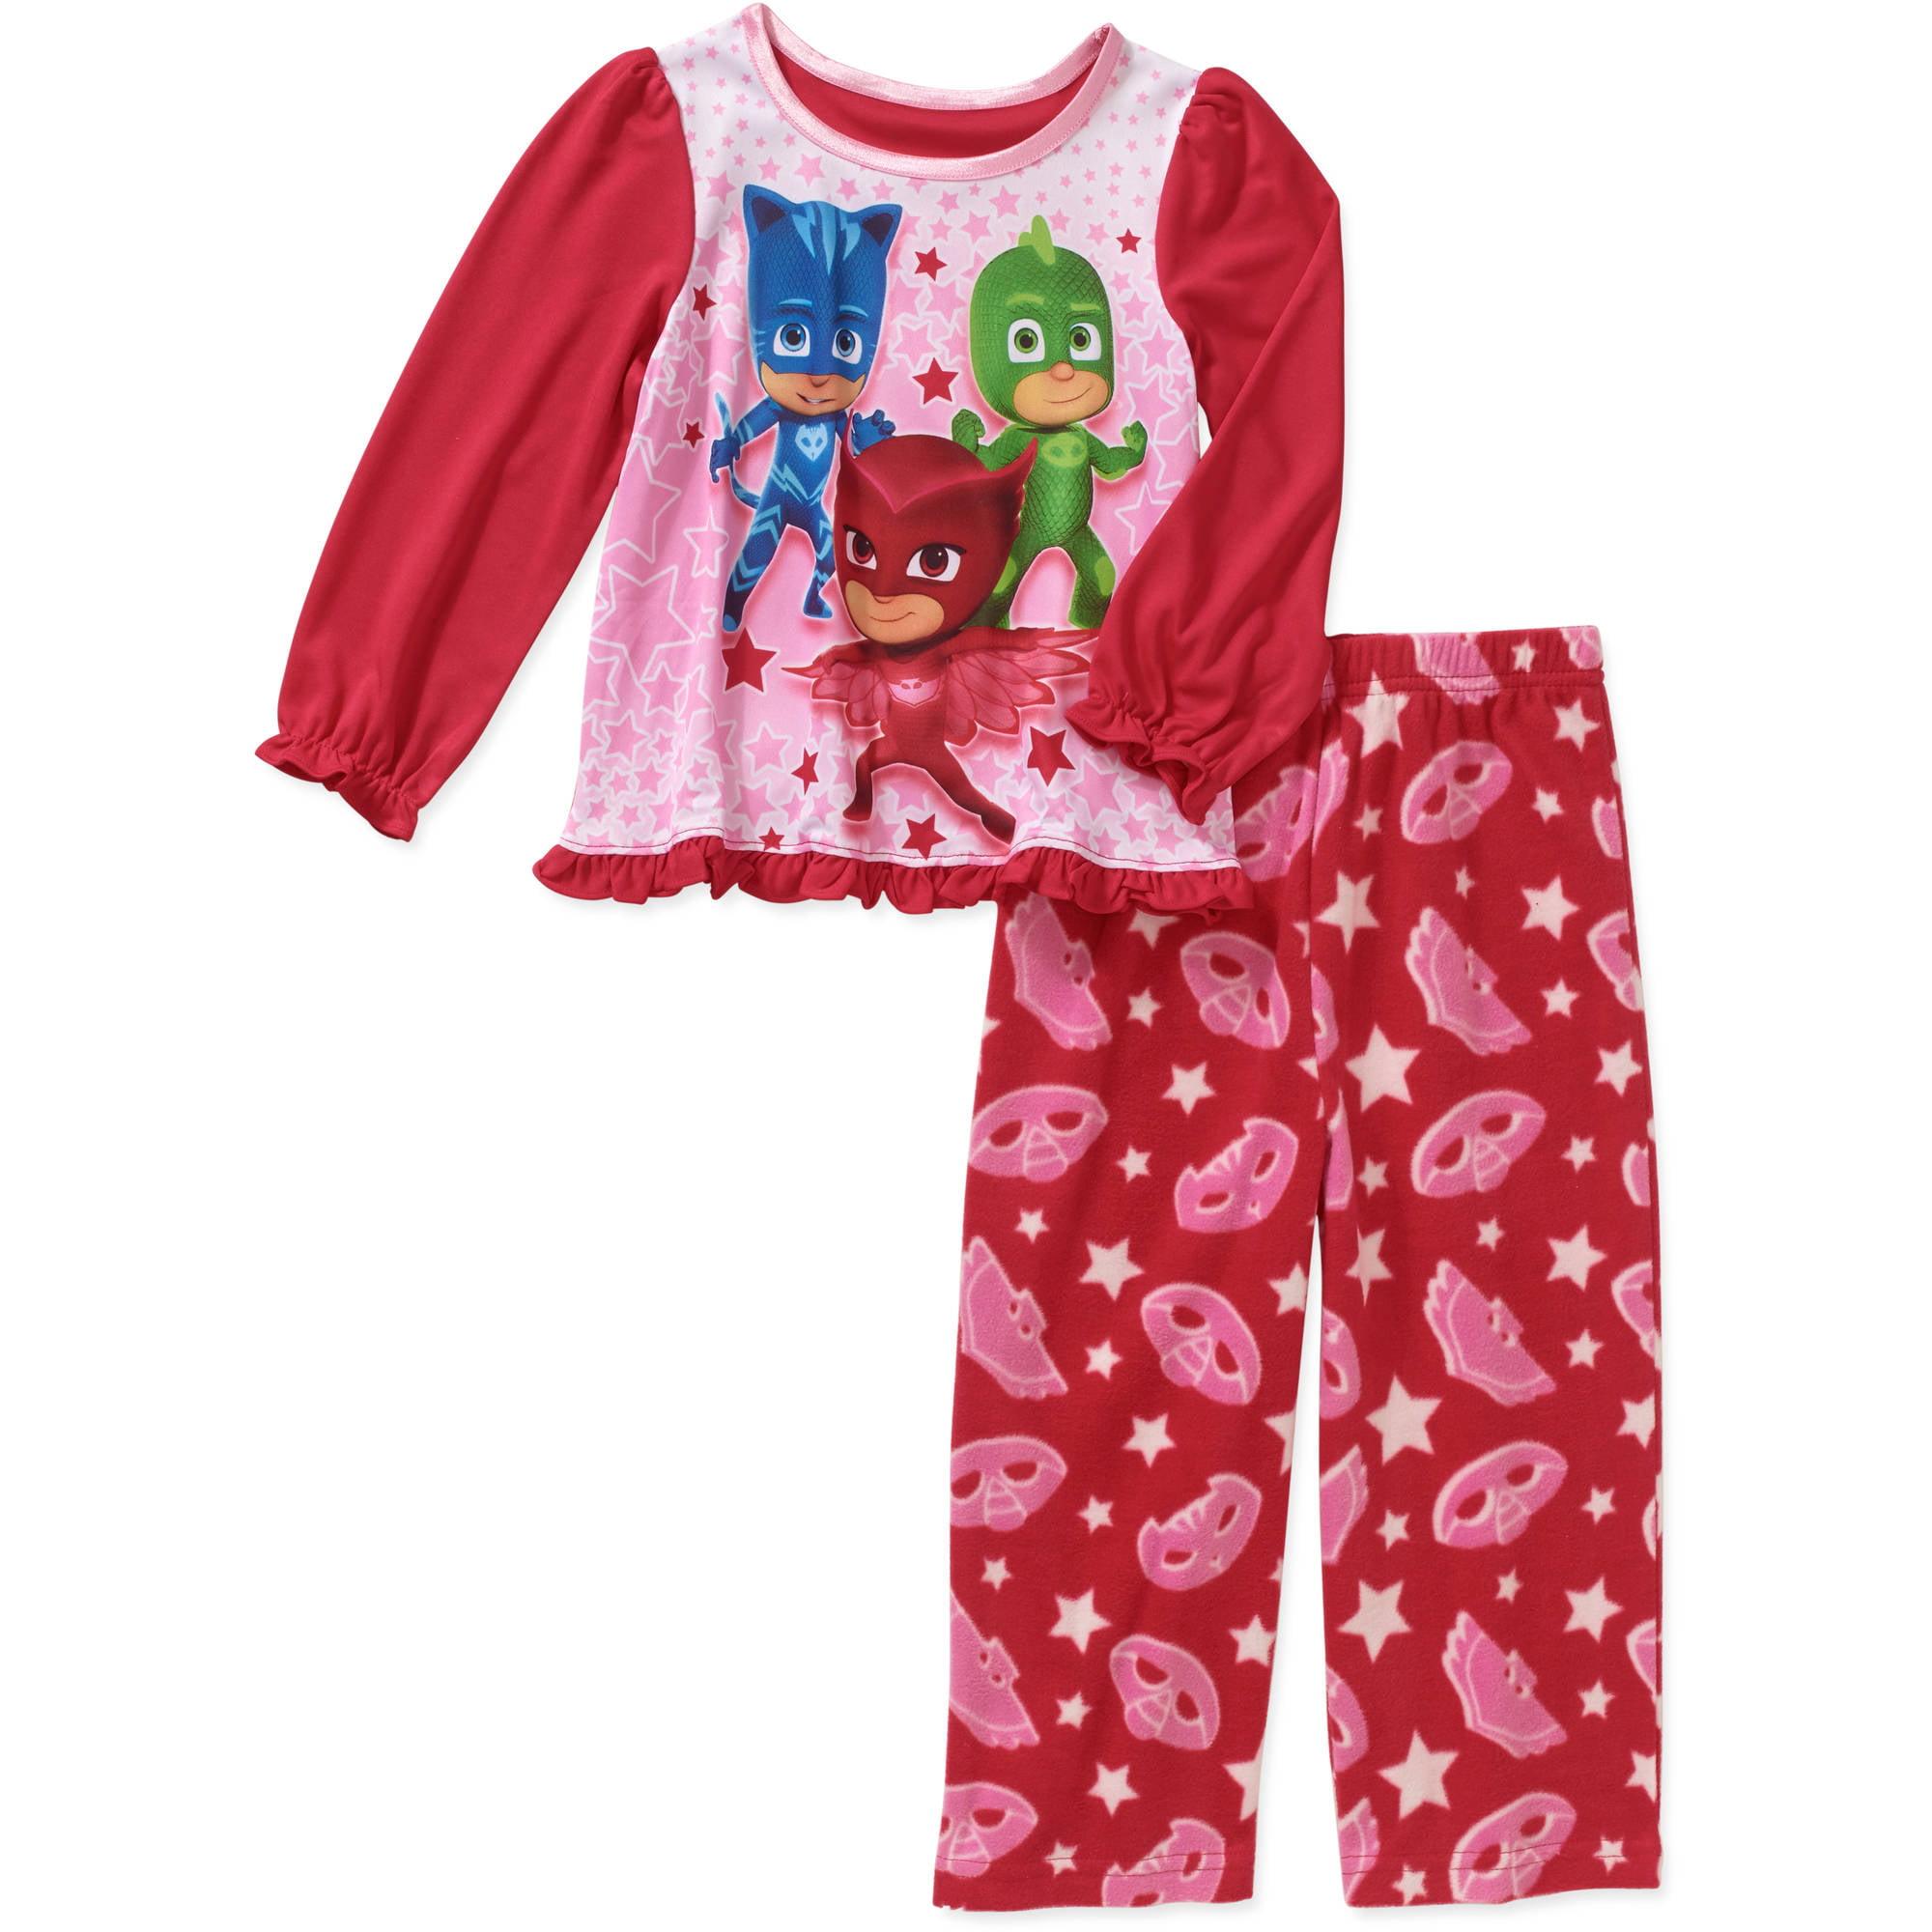 PJ Masks Toddler Girl Long Sleeve Top with Fleece Pants ...